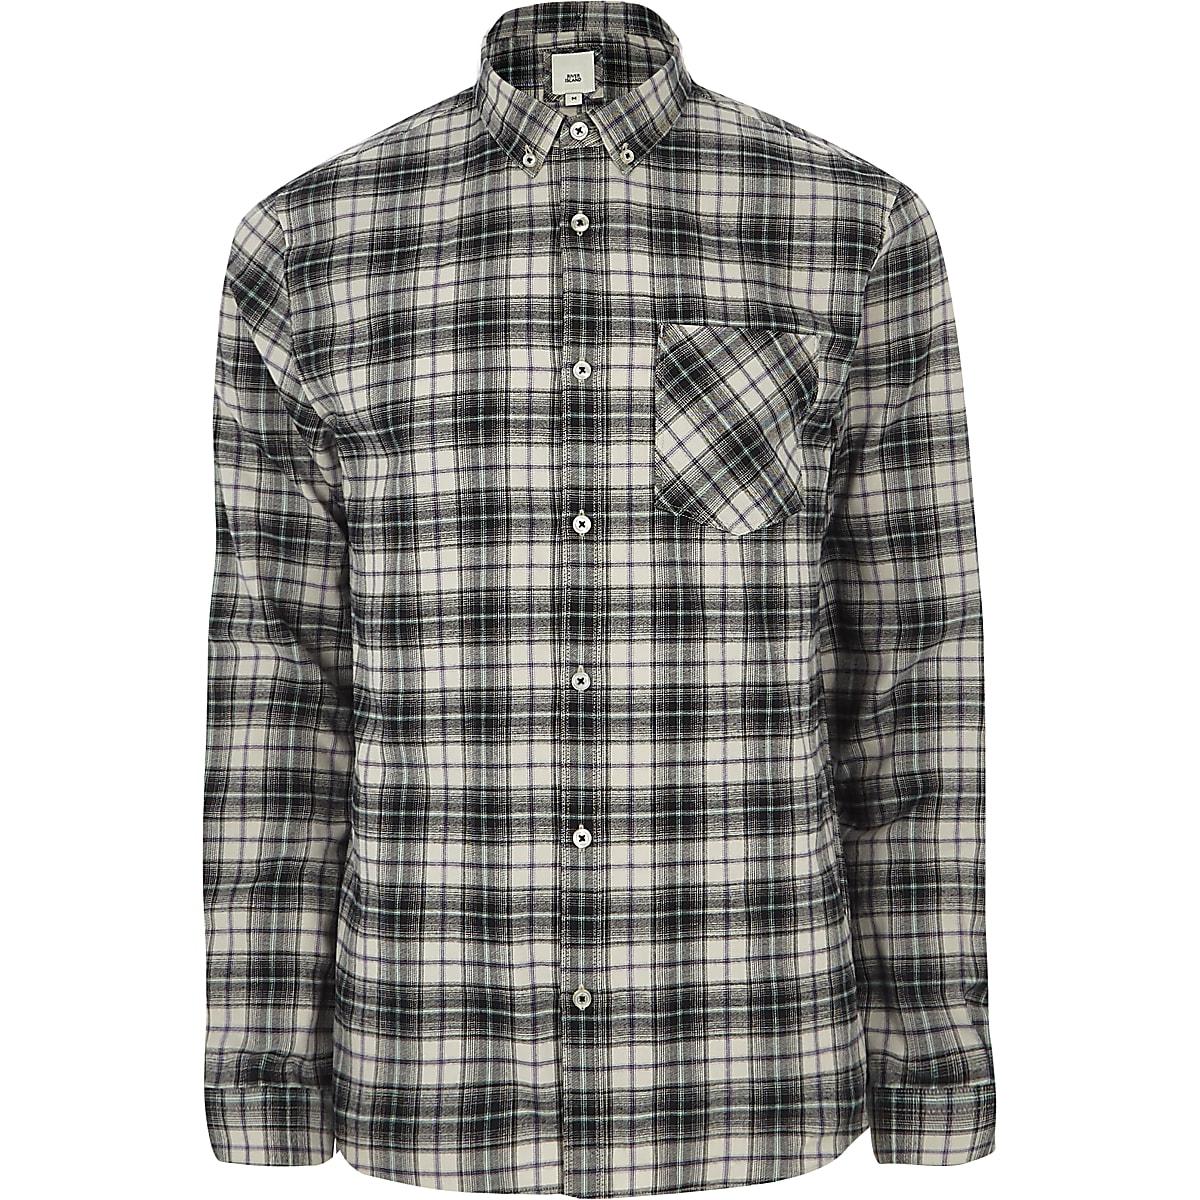 Grey check long sleeve button-down shirt